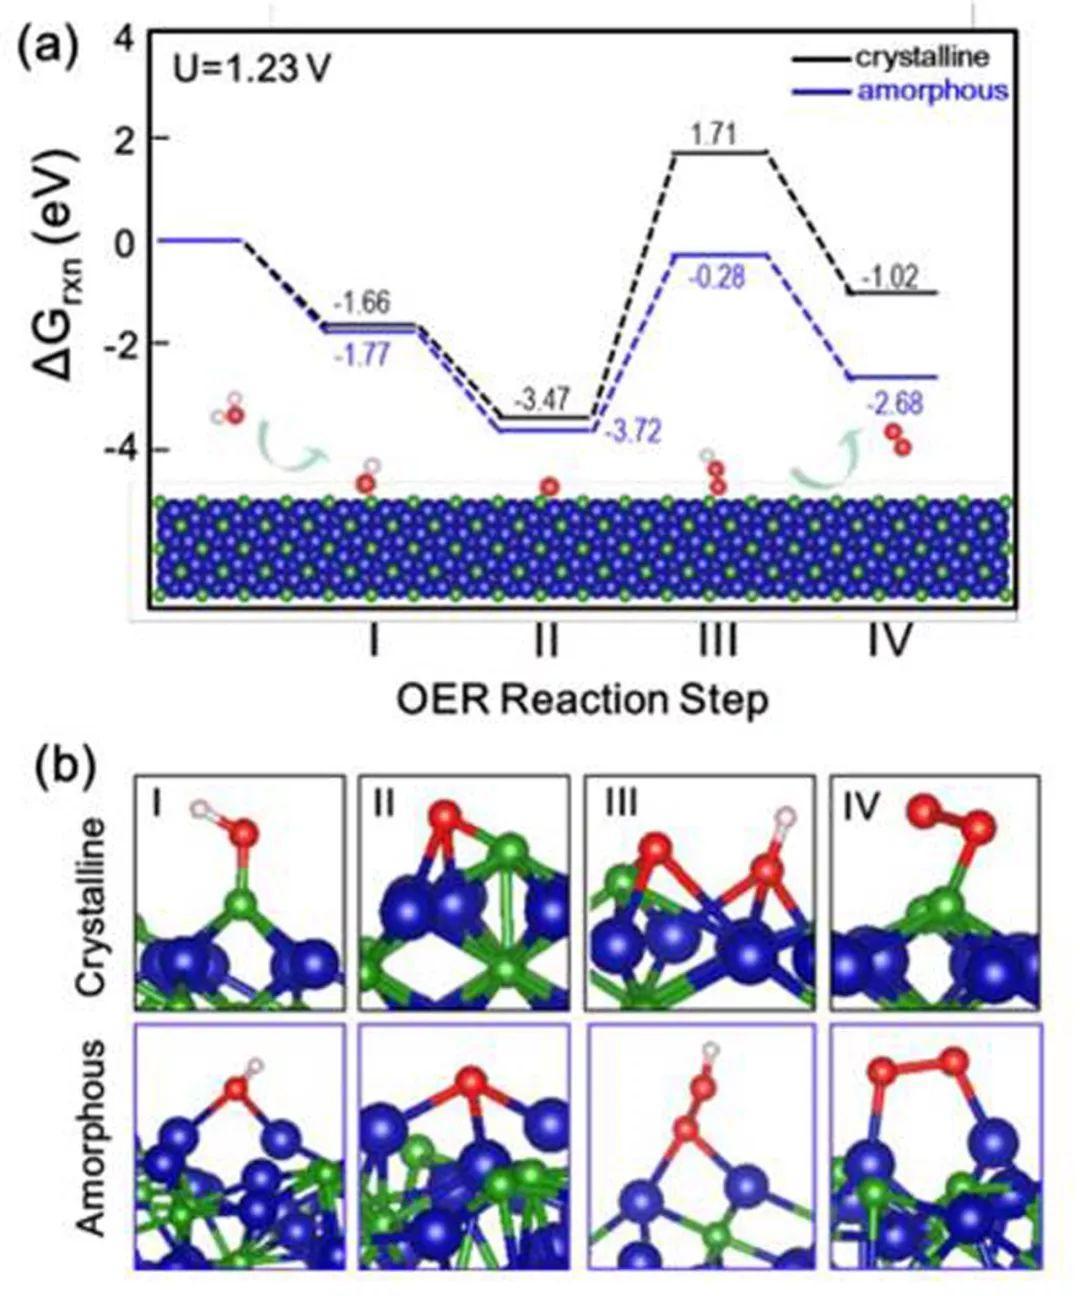 EES:晶态-非晶态相界面显著增强电催化析氧活性